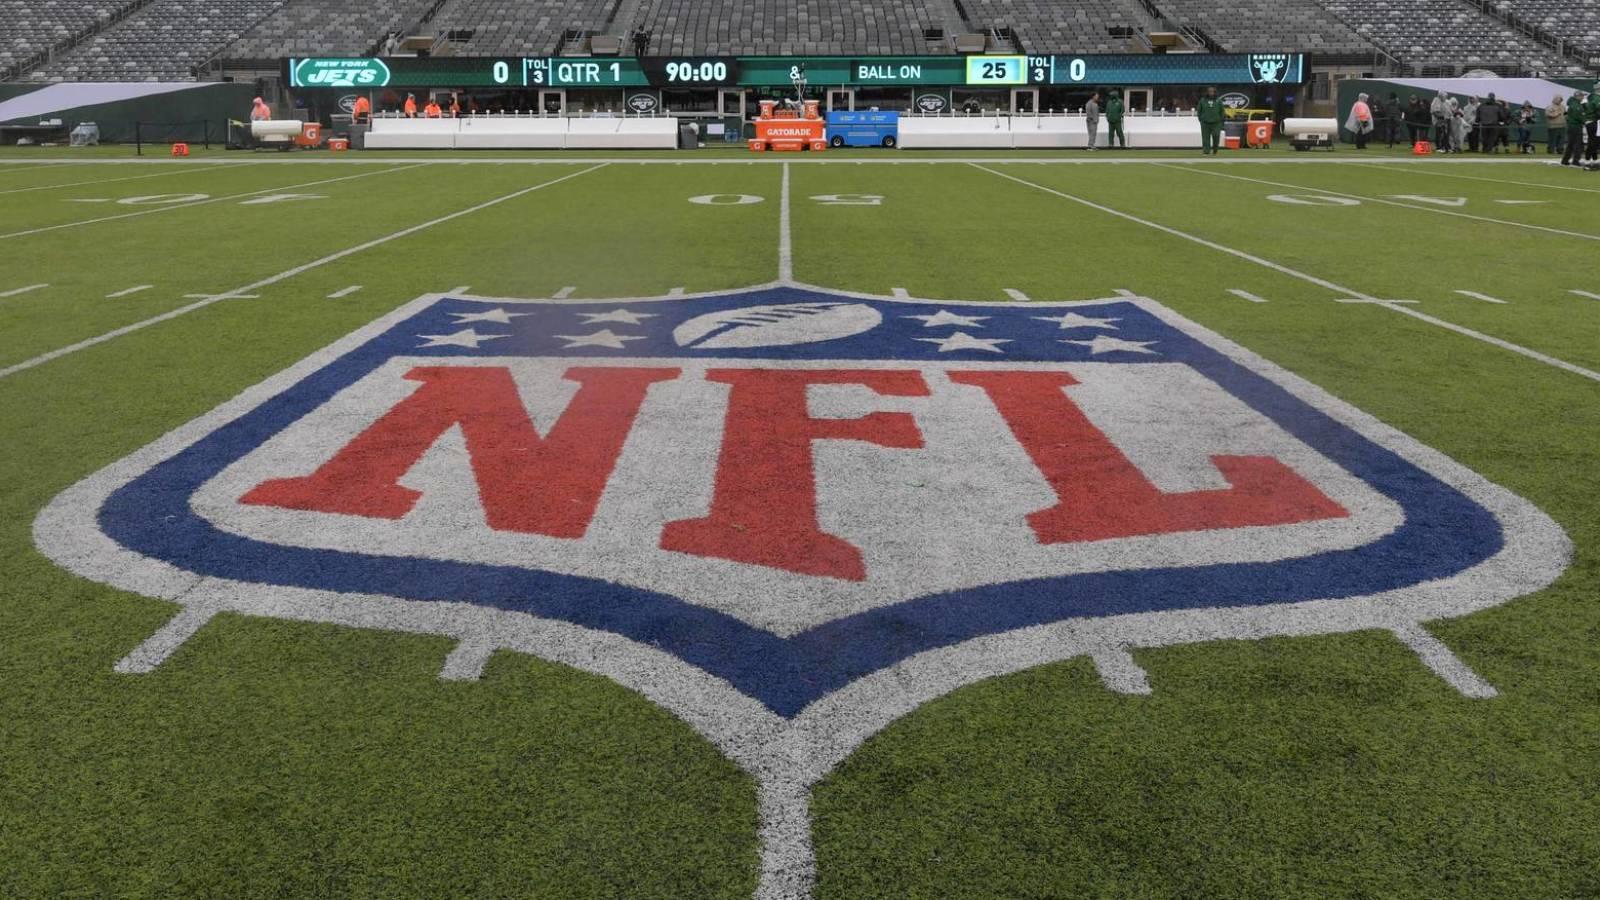 NFL delays deciding on expanding regular season until 2021 | Yardbarker